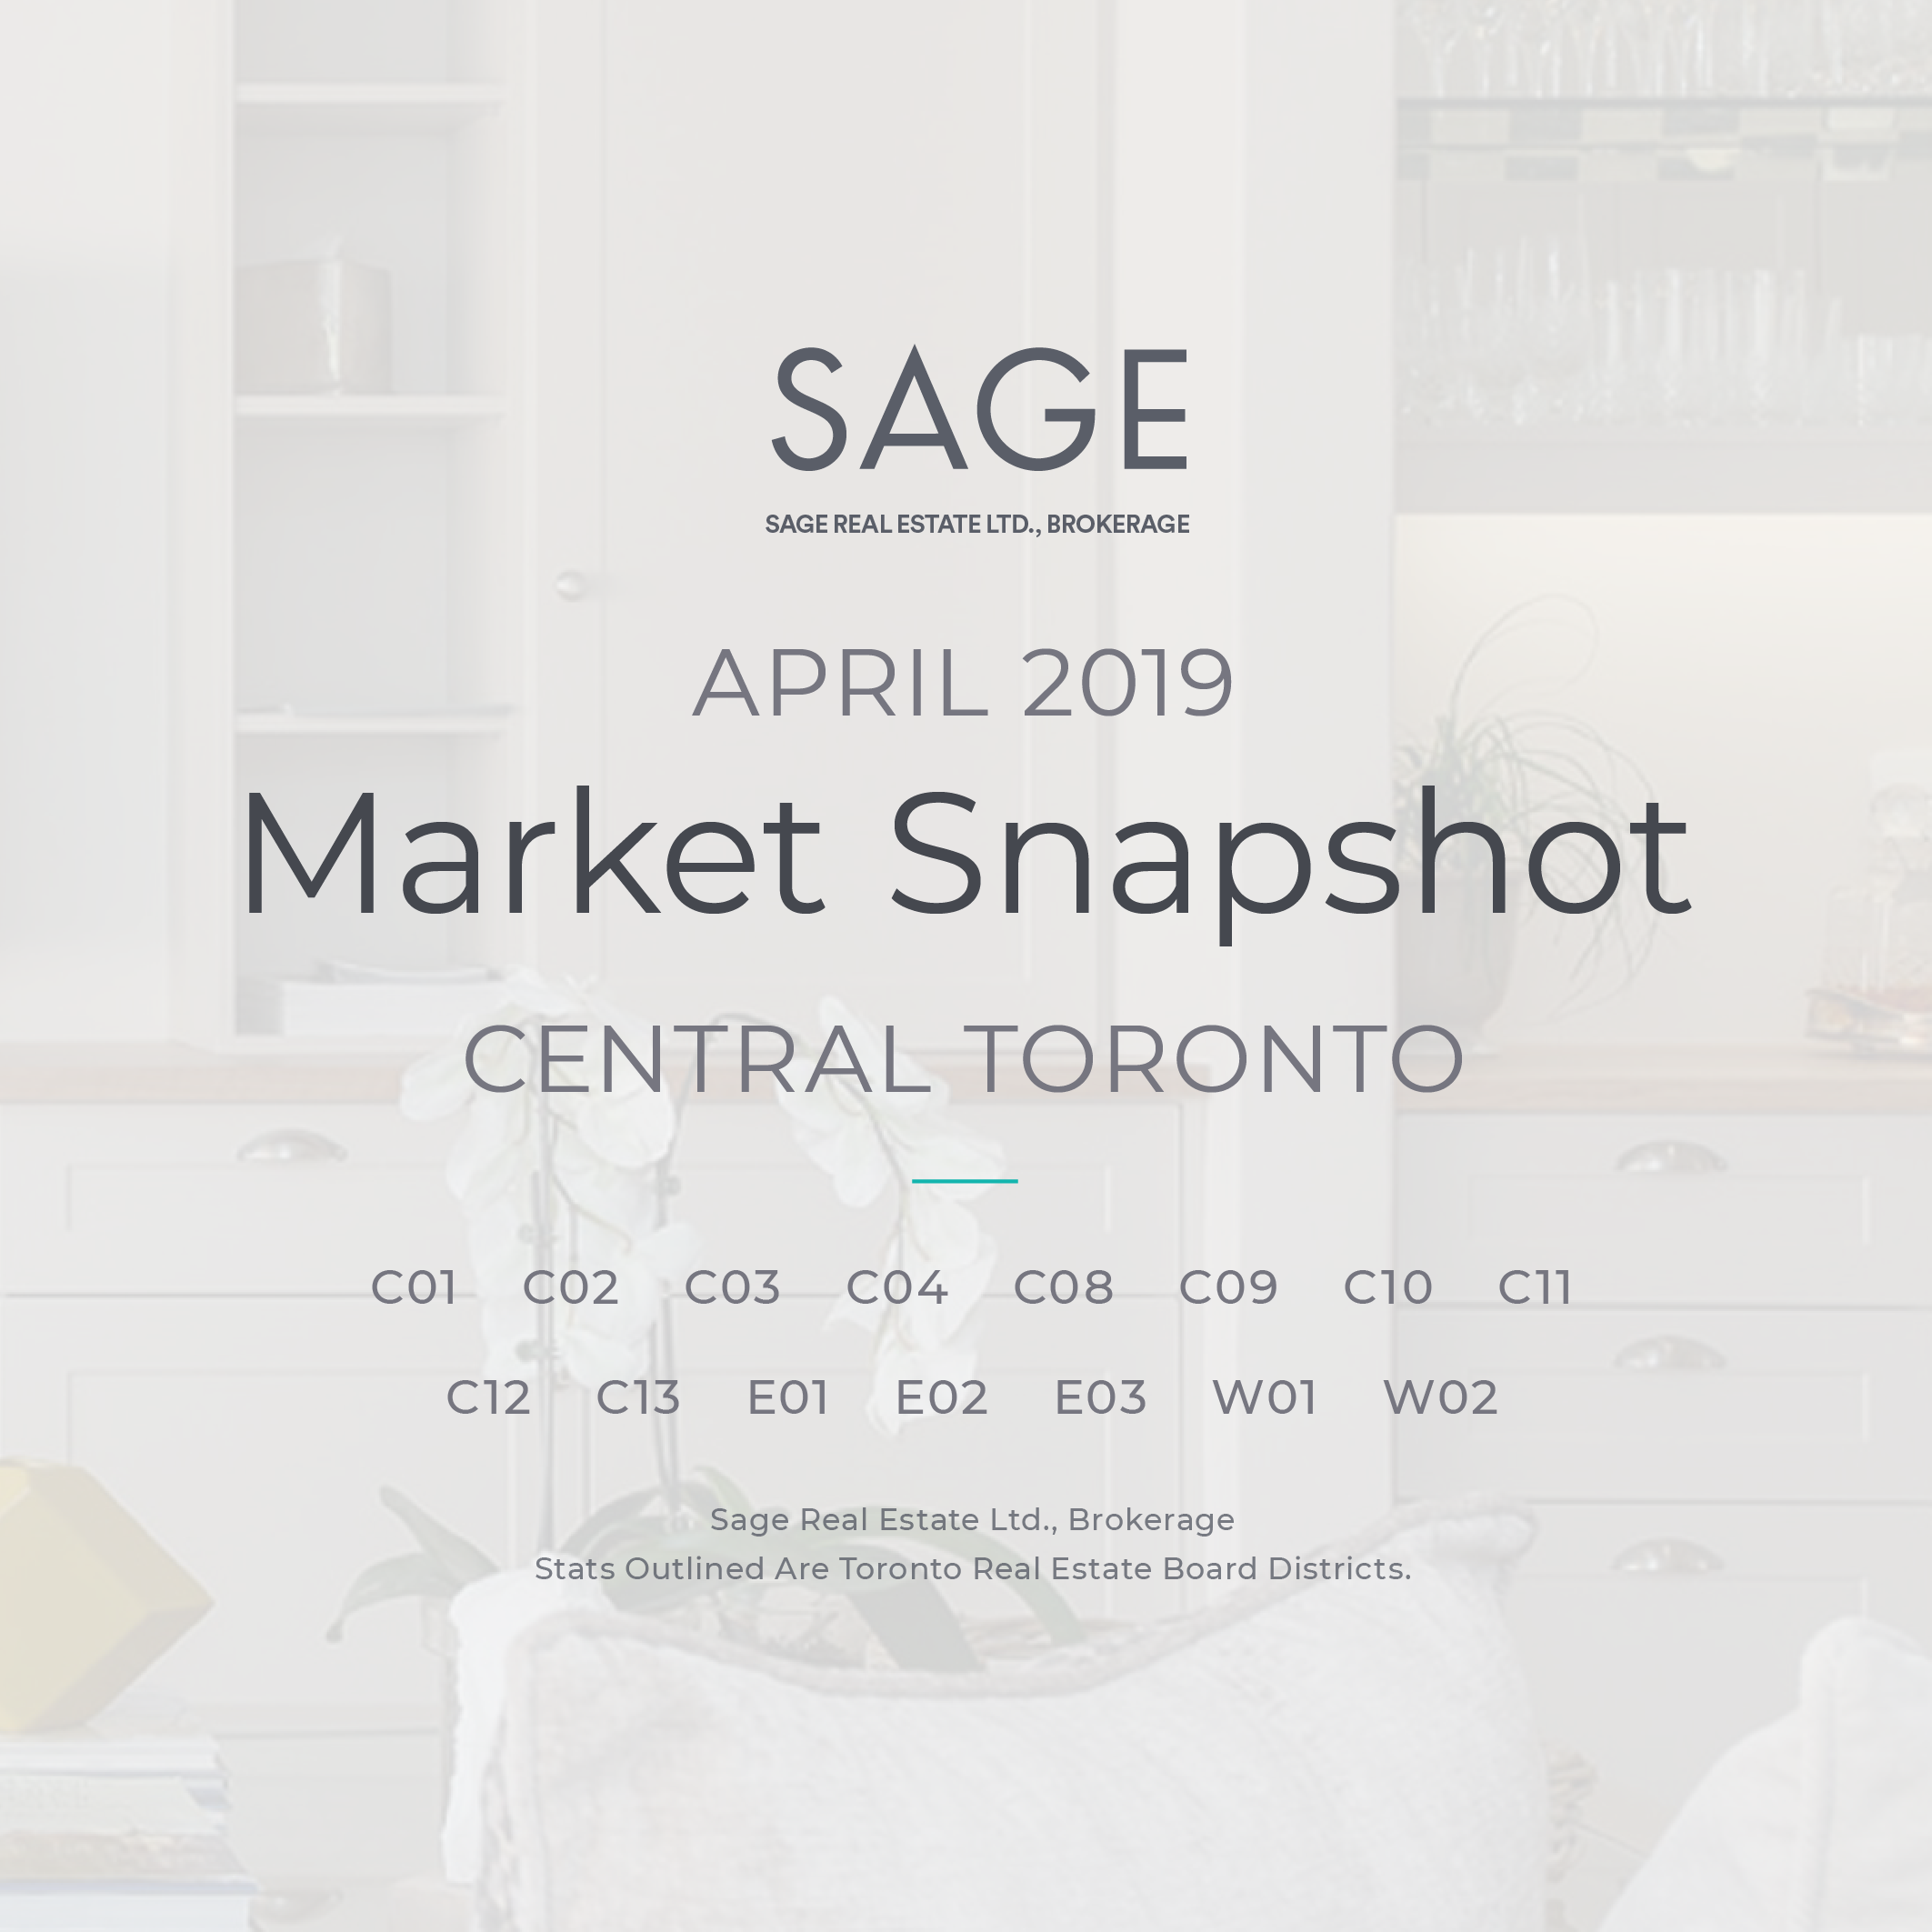 SageStateoftheMarket_April2019_Instagram_Cover.png